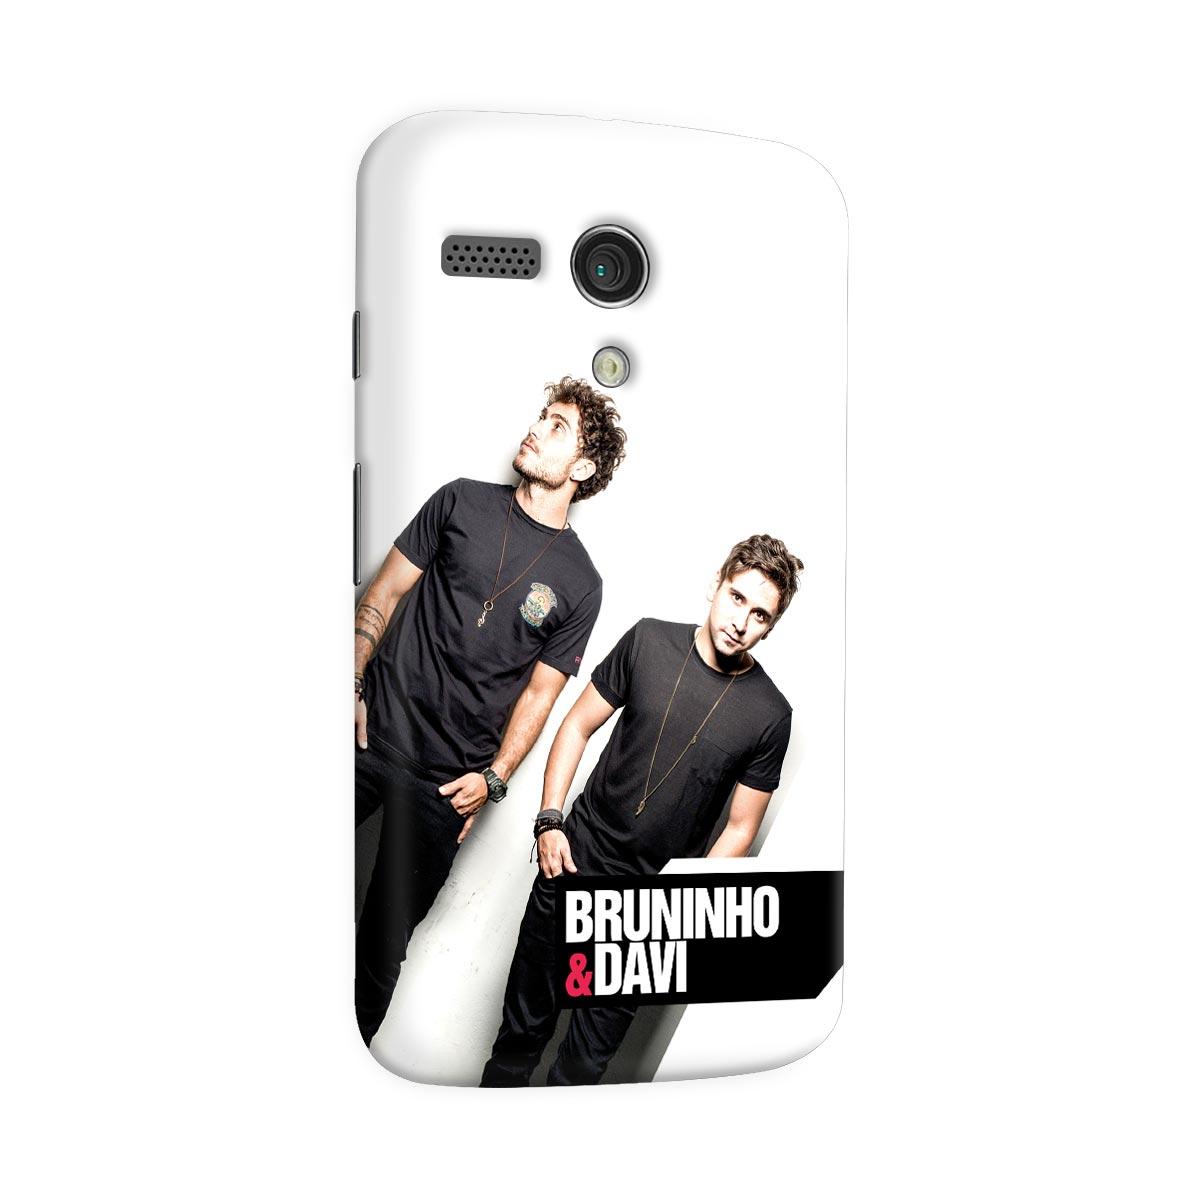 Capa para Motorola Moto G 1 Bruninho & Davi Foto